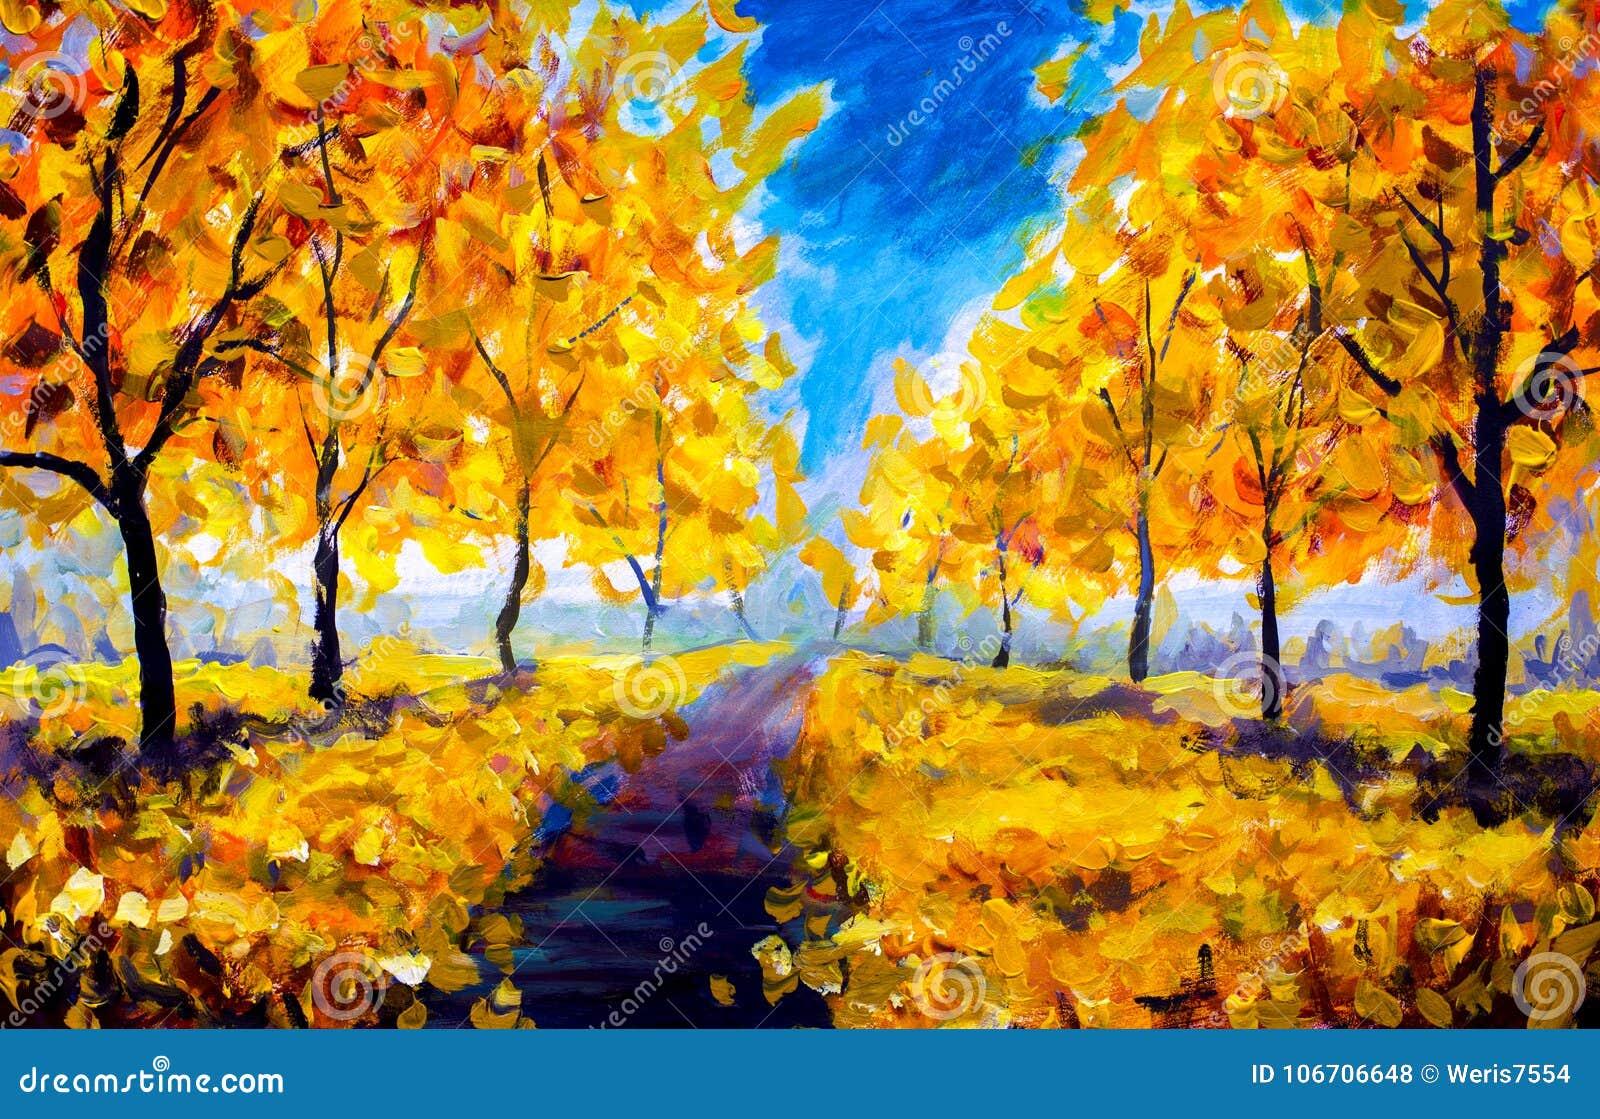 Oil Painting - autumn, yellow foliage, park, autumn trees